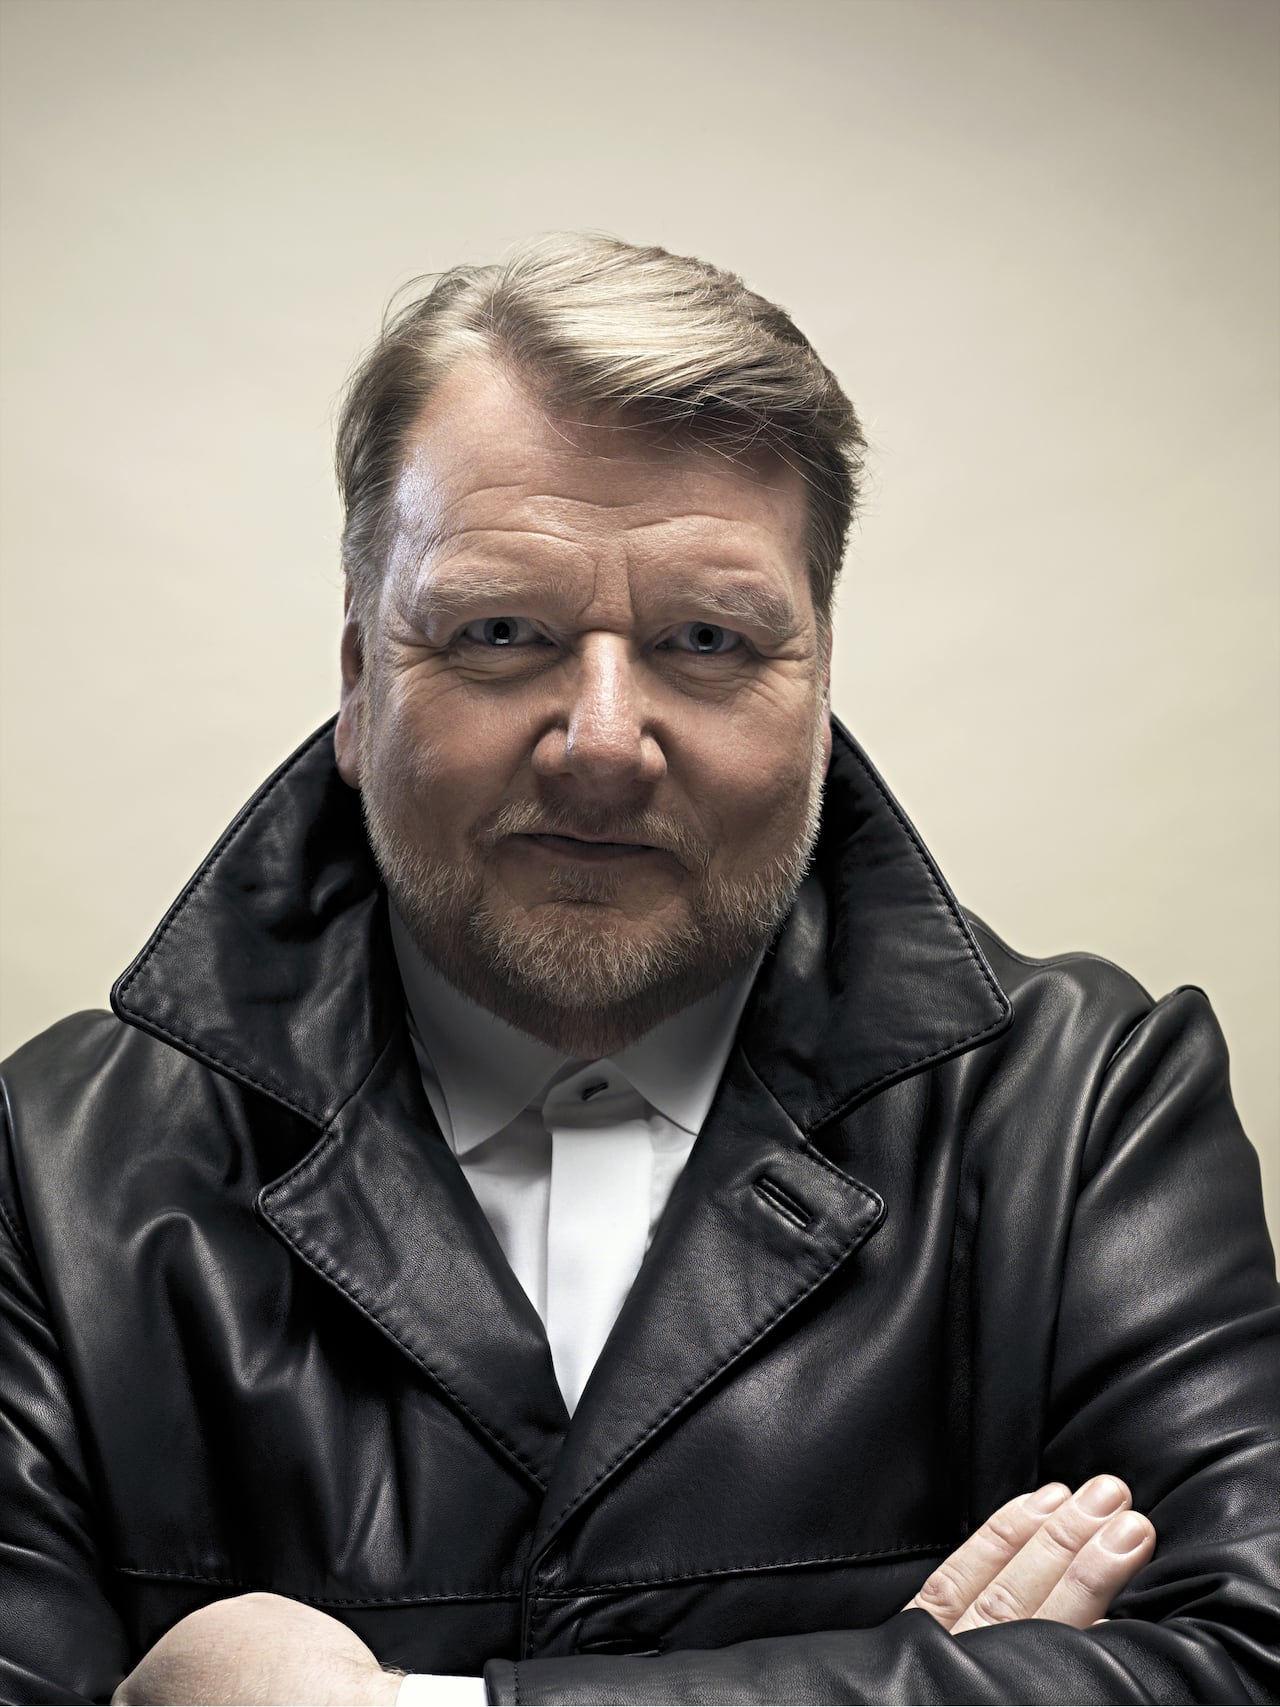 Ben Heppner, star tenor, announces retirement from singing   CBC News